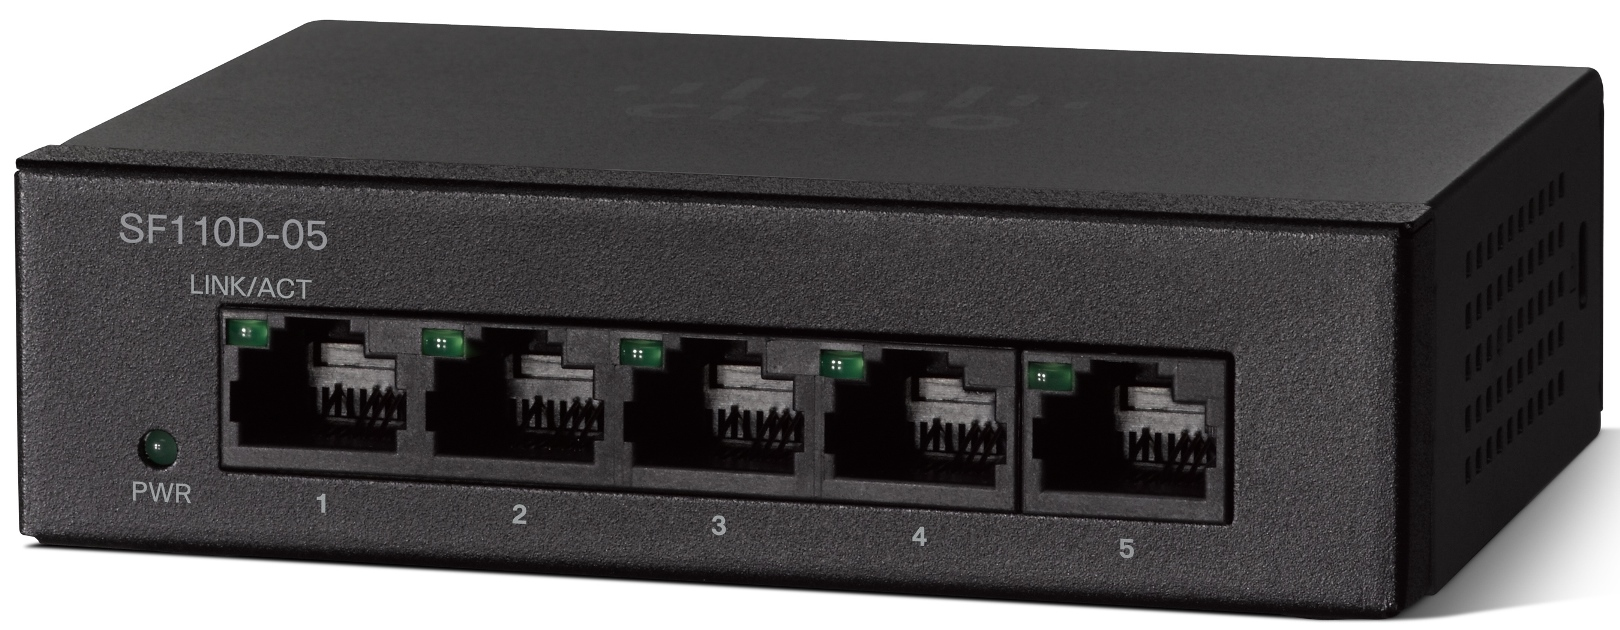 Cisco SF110D-05-EU, 5x10/100 Desktop Switch